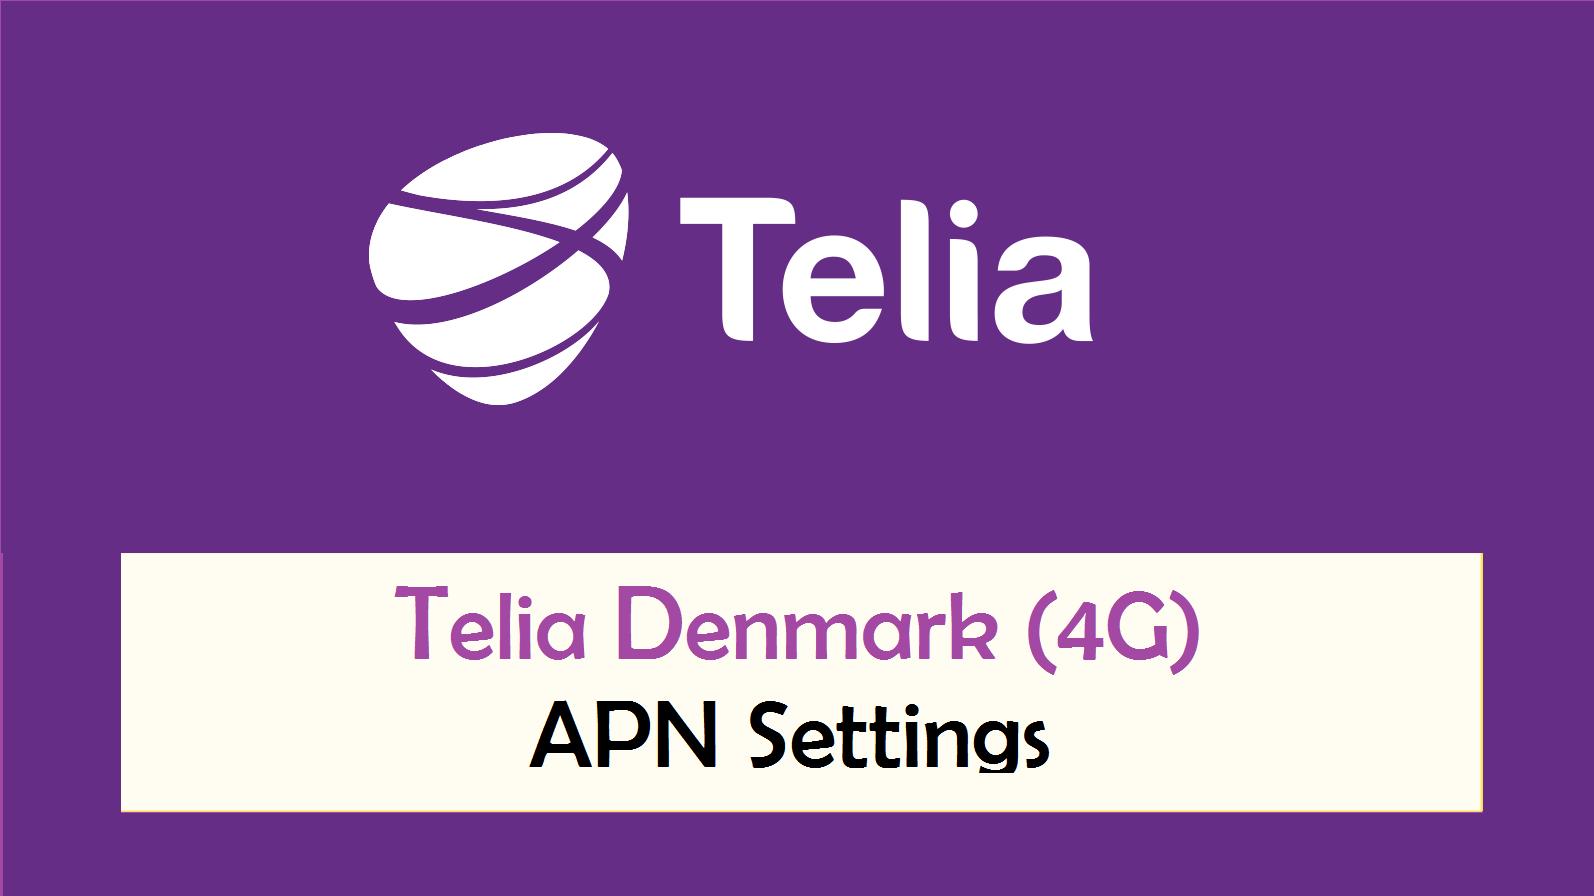 Telia Denmark APN Settings